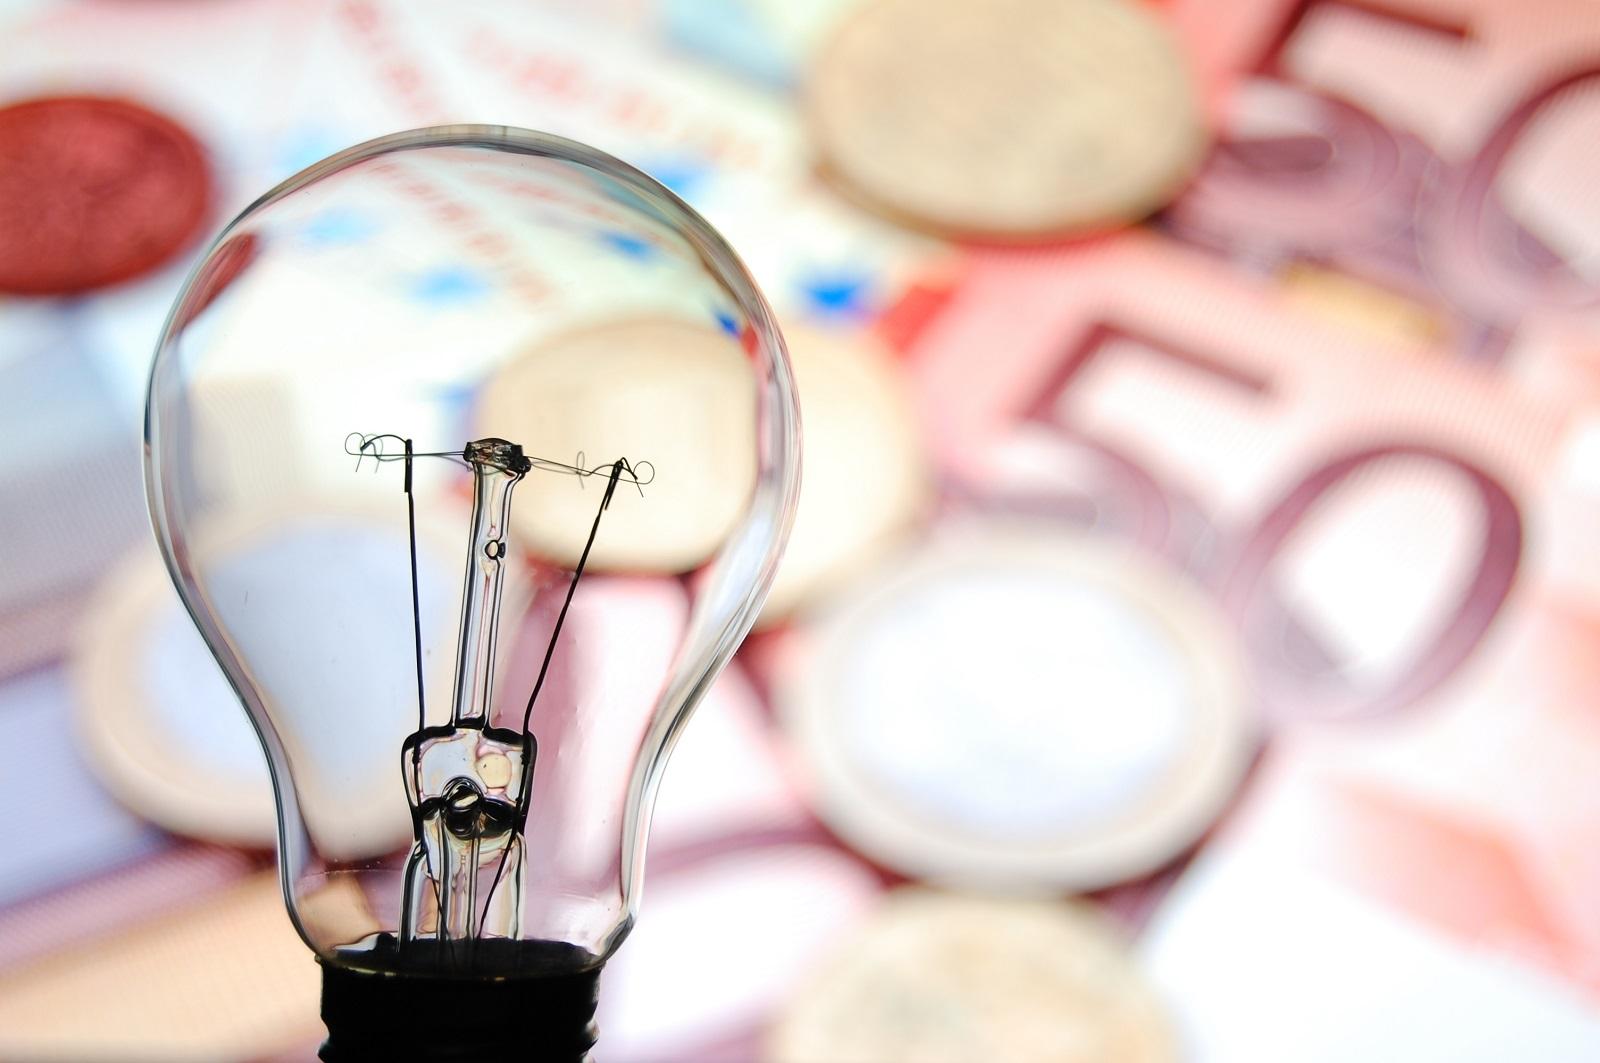 Tariffe elettricit antitrust indaga su enel a2a e acea - Elettricita in casa ...